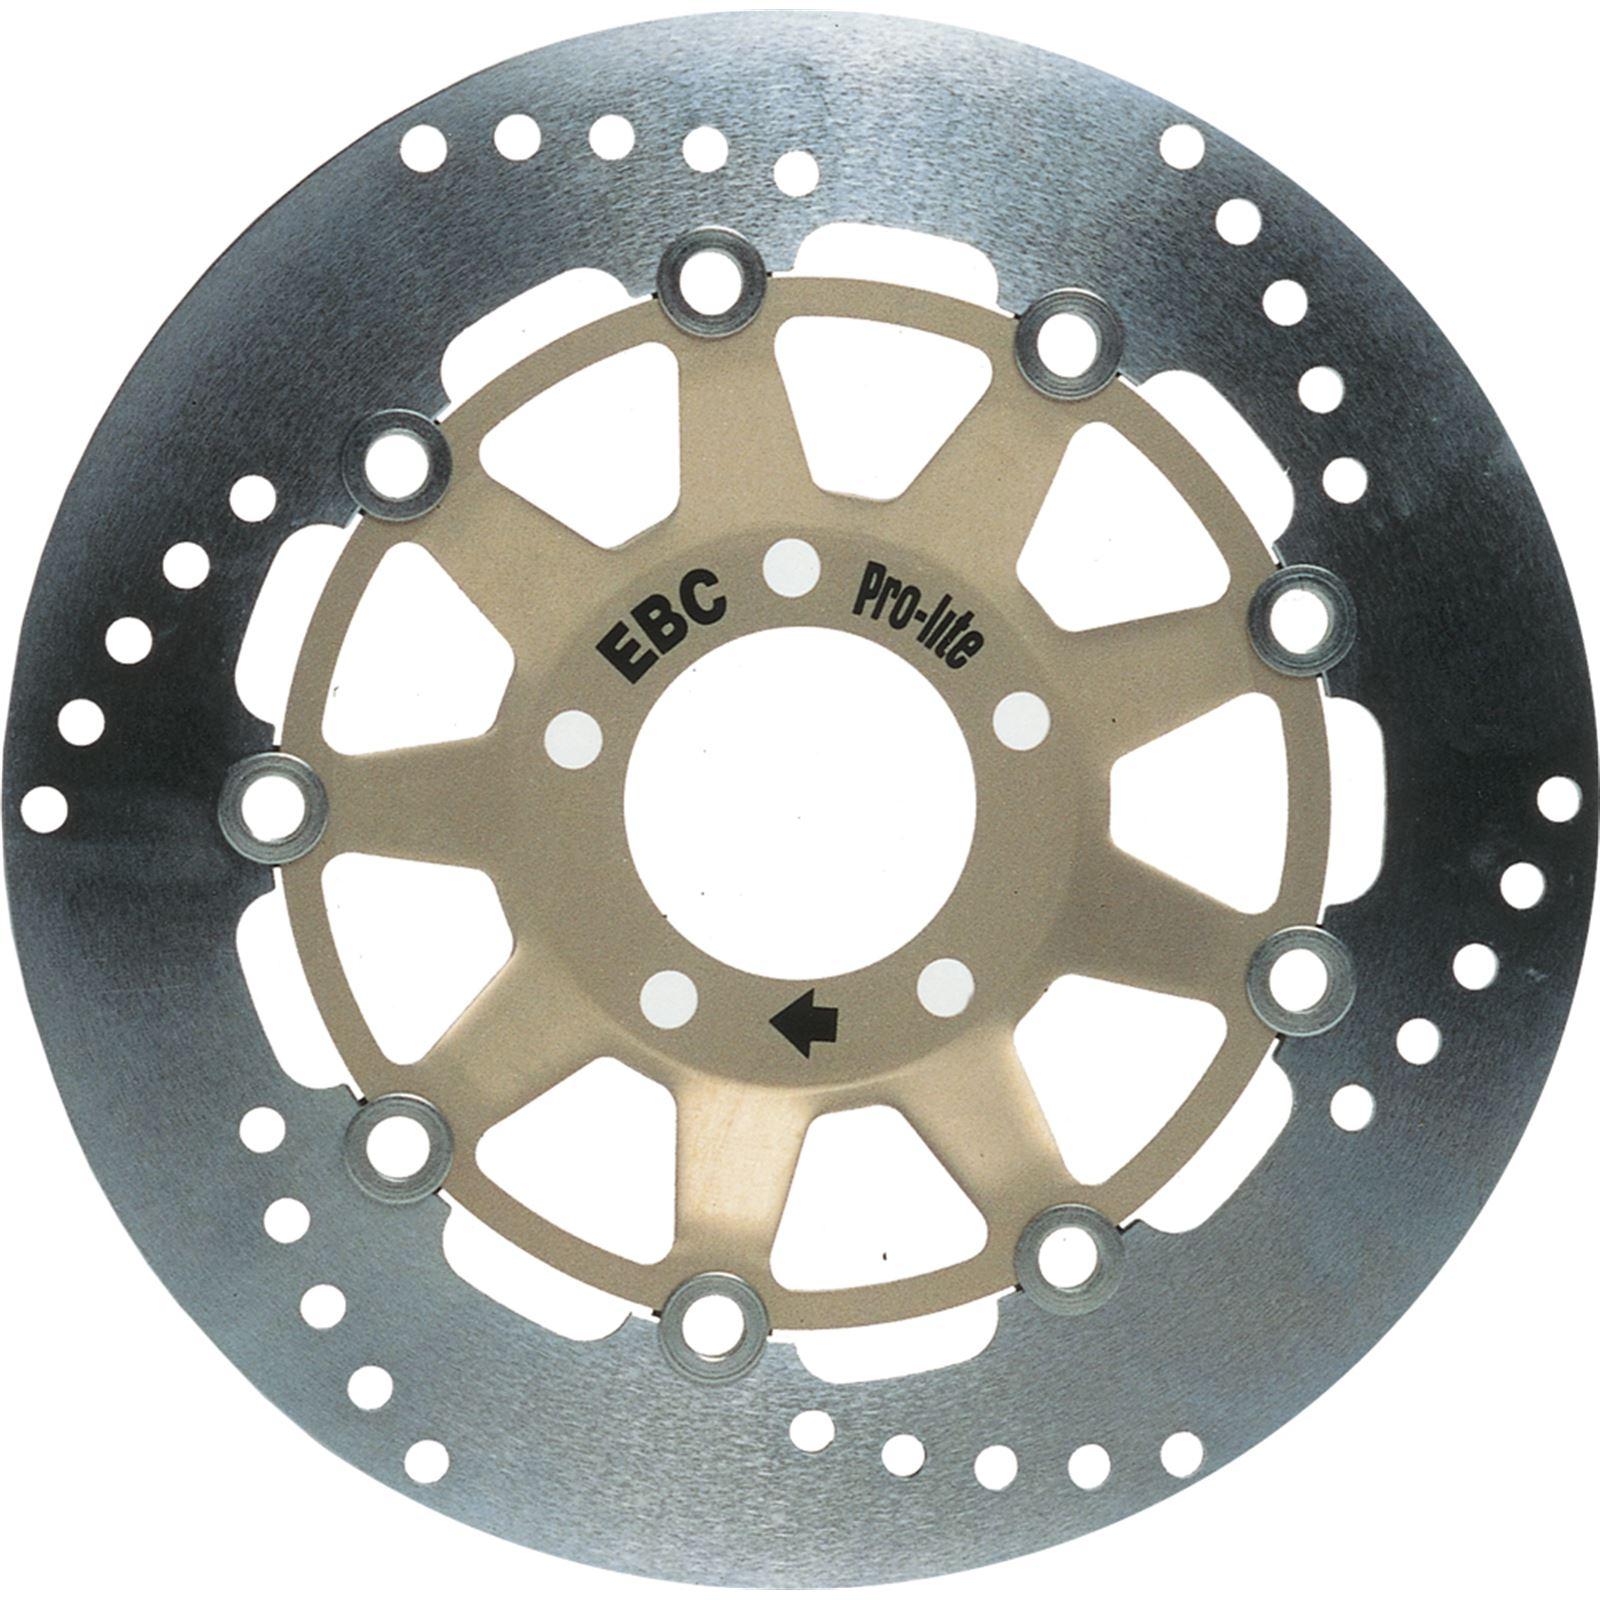 EBC Standard Rotor Brake Discs